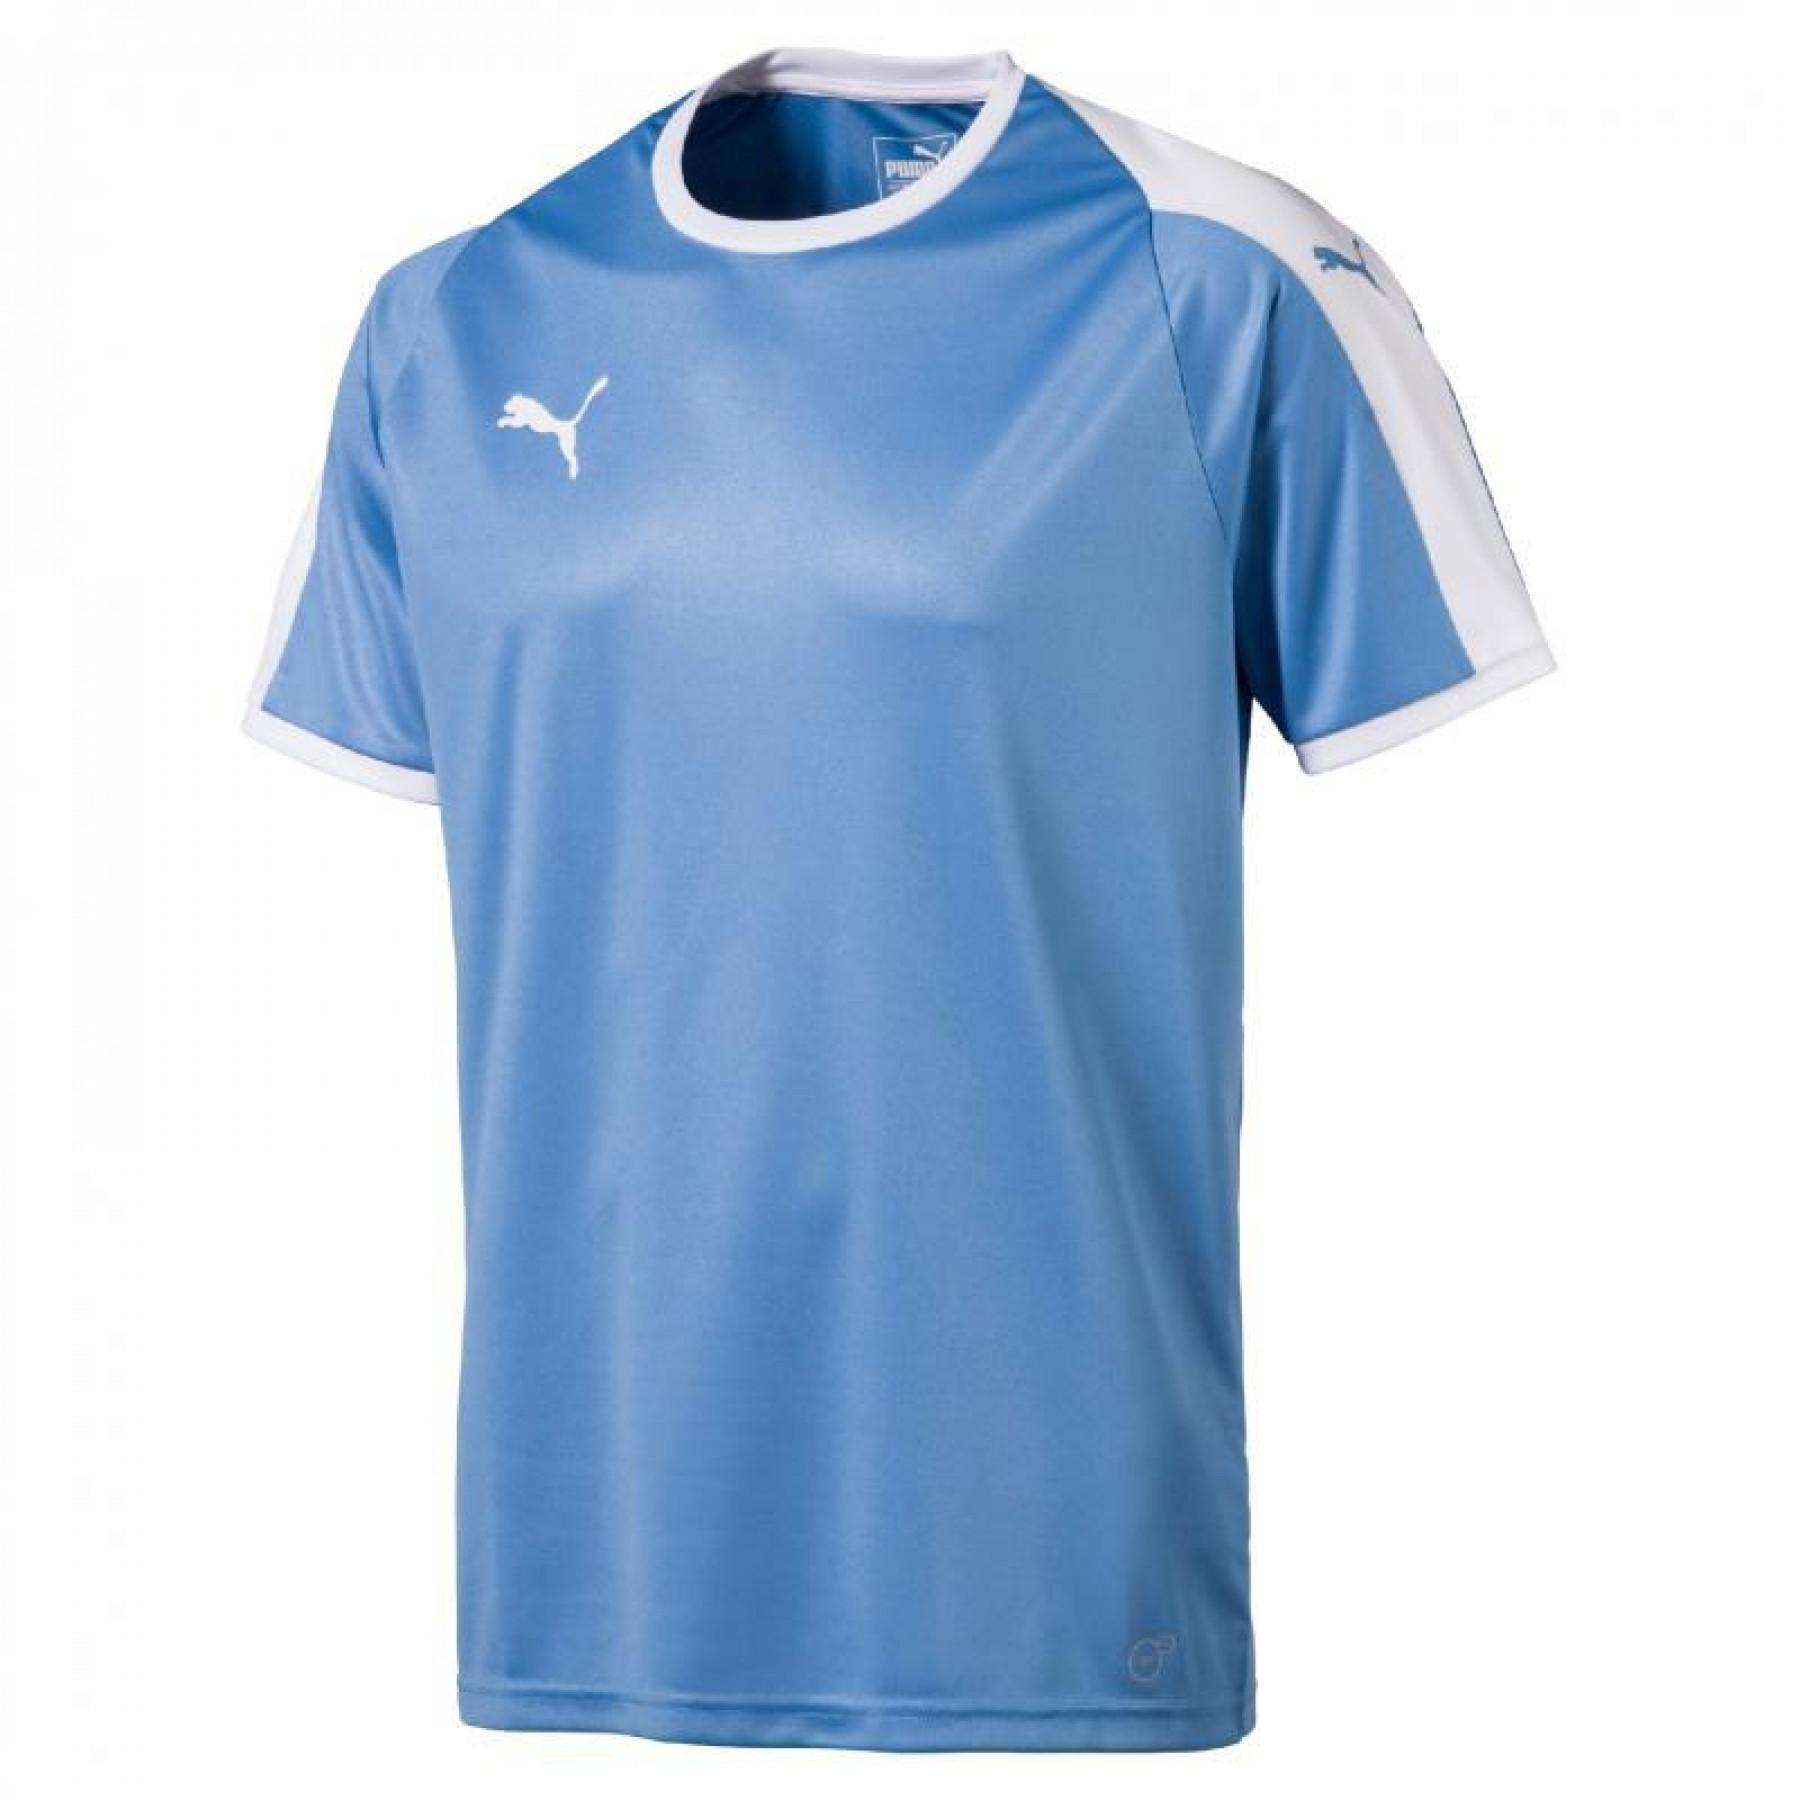 Puma jersey Liga